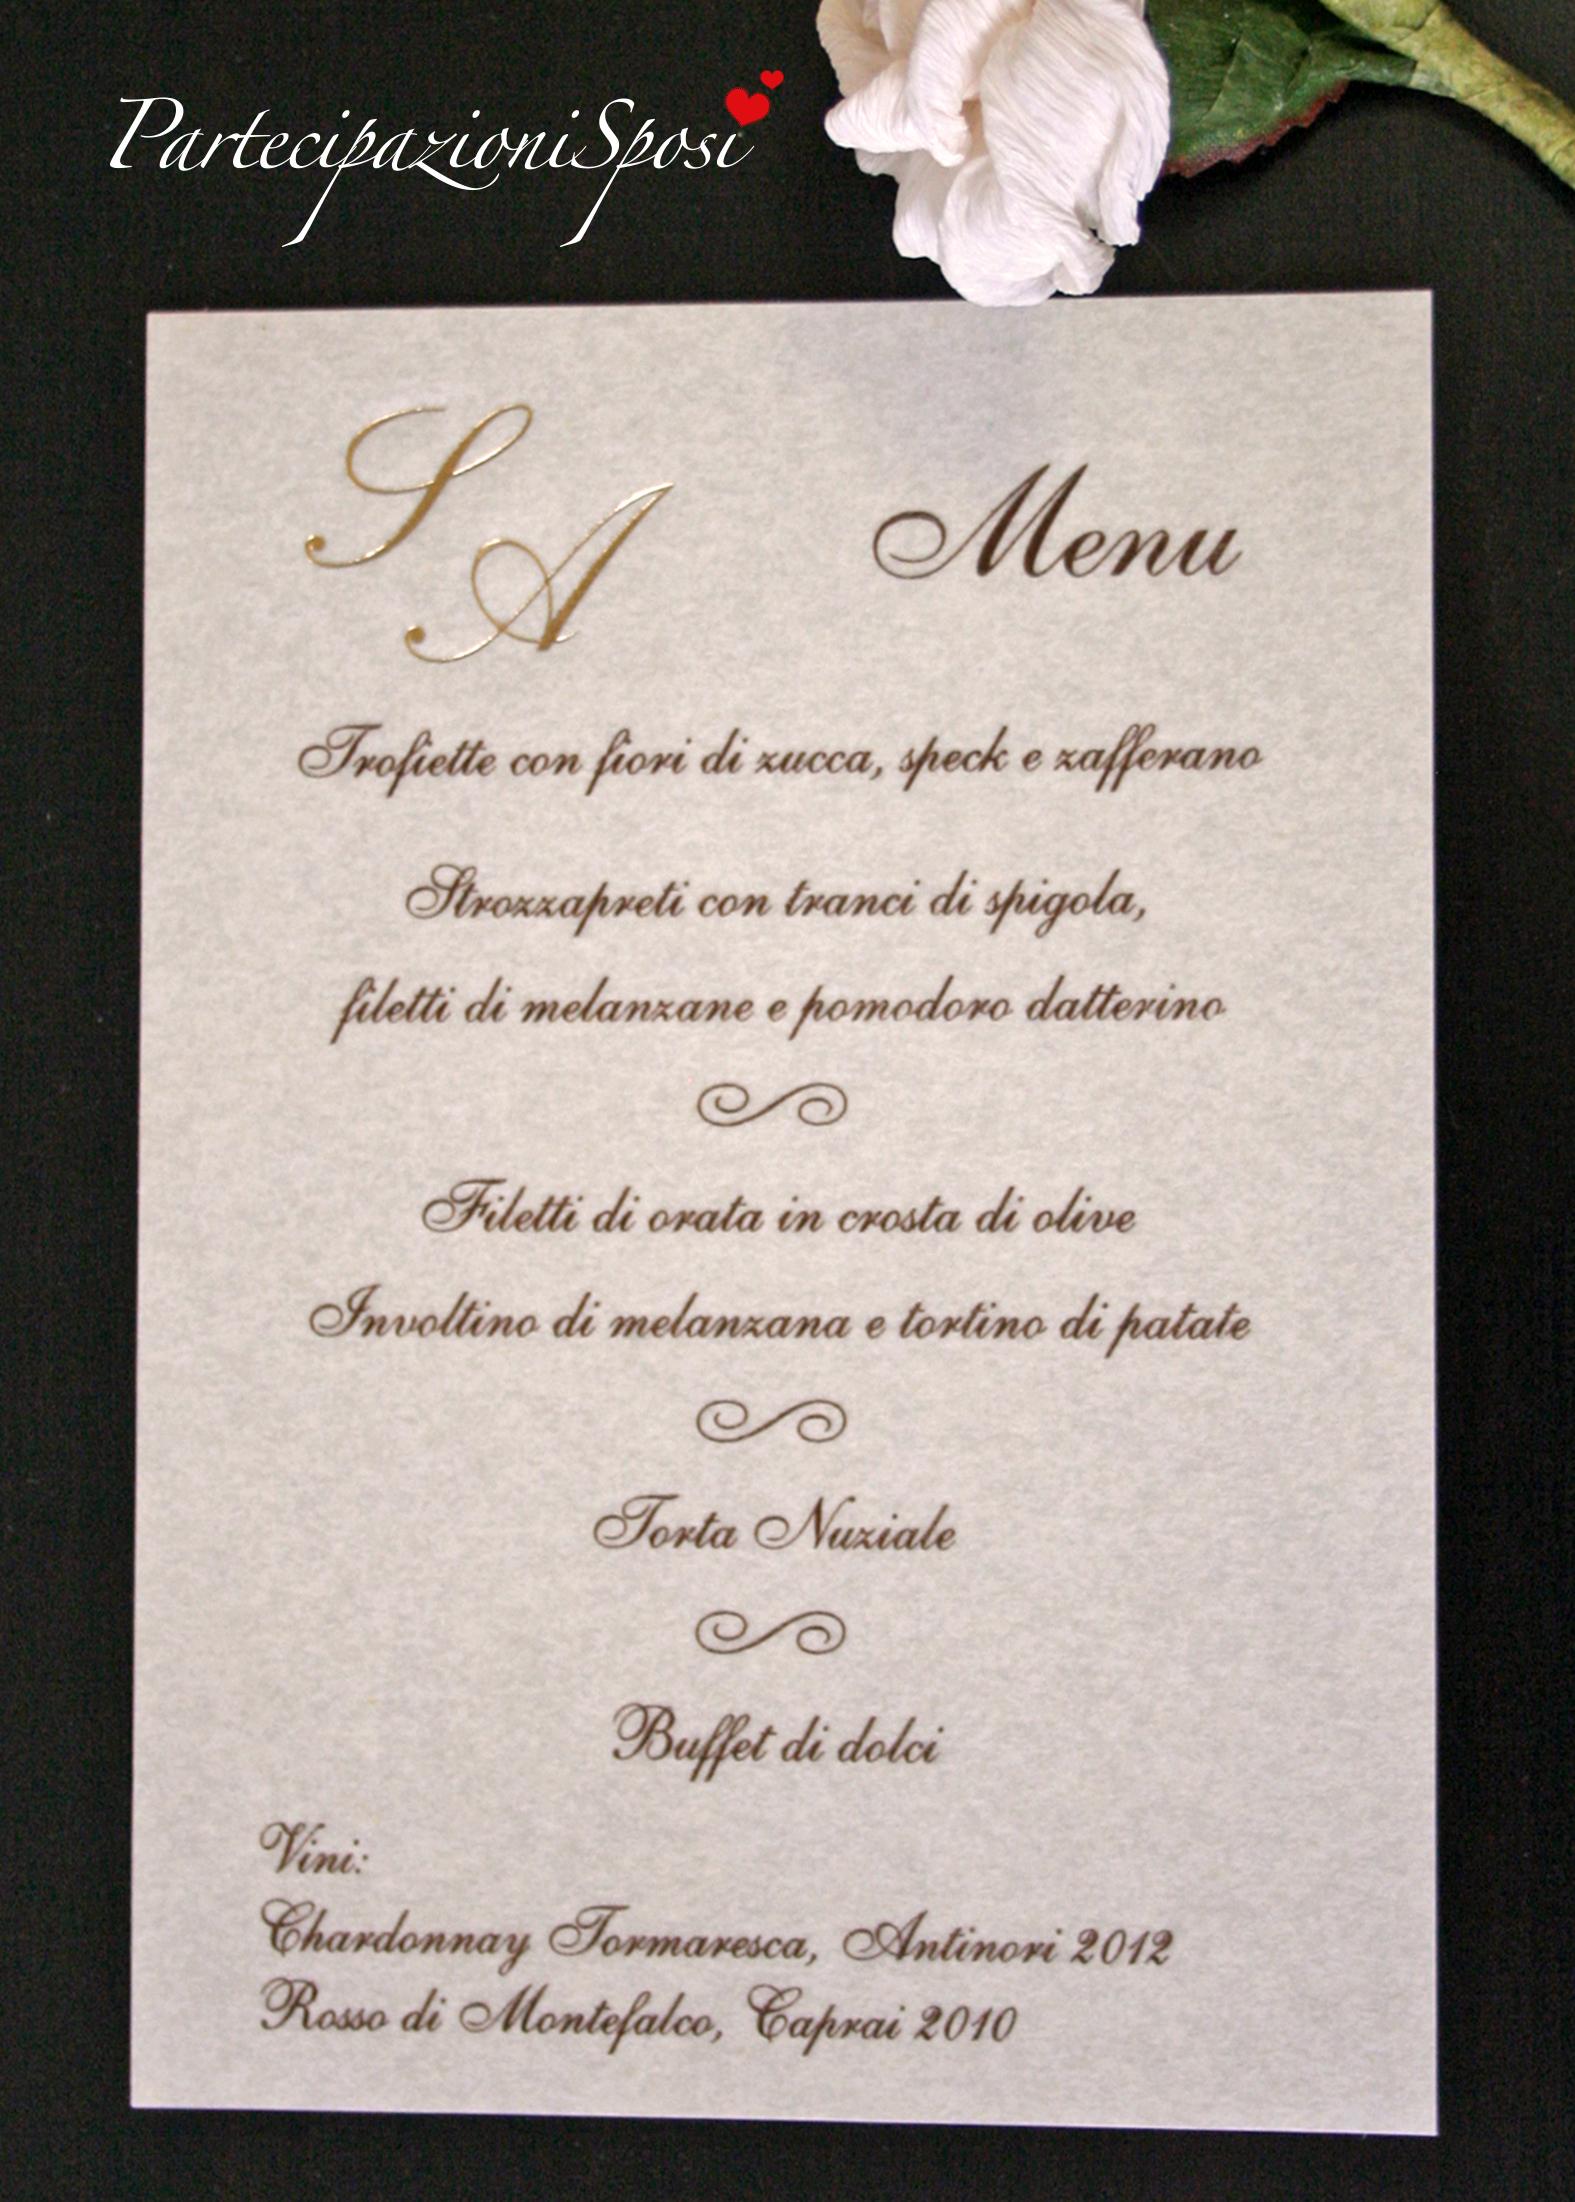 Anniversario Di Matrimonio Menu.Menu In Carta Pergamena Partecipazioni Sposi Stampa